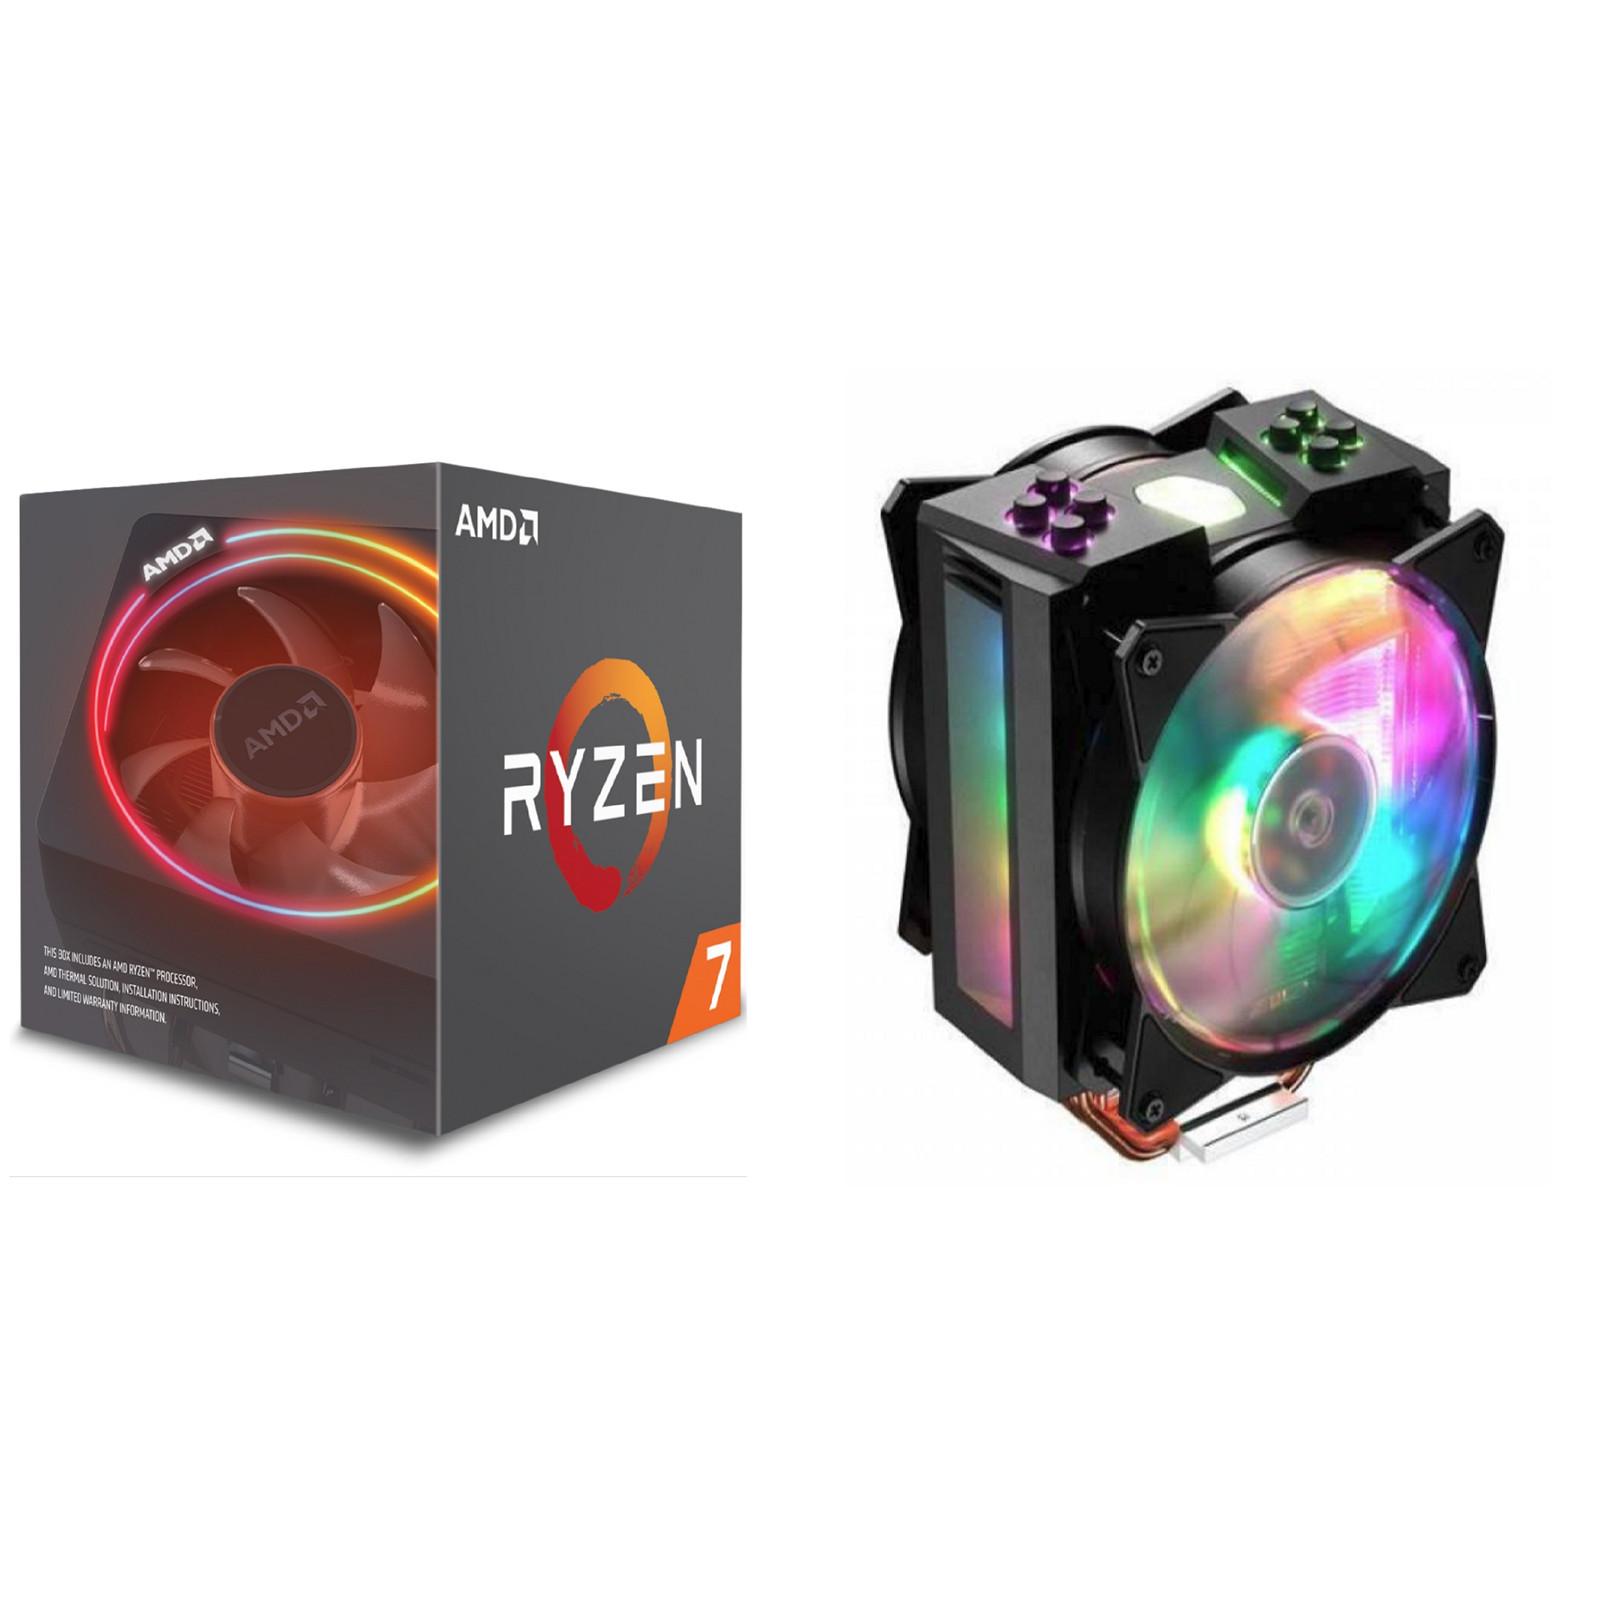 Buy the PB Upgrade Kits CPU & Cooling Kit 13005 AMD Ryzen7 2700X